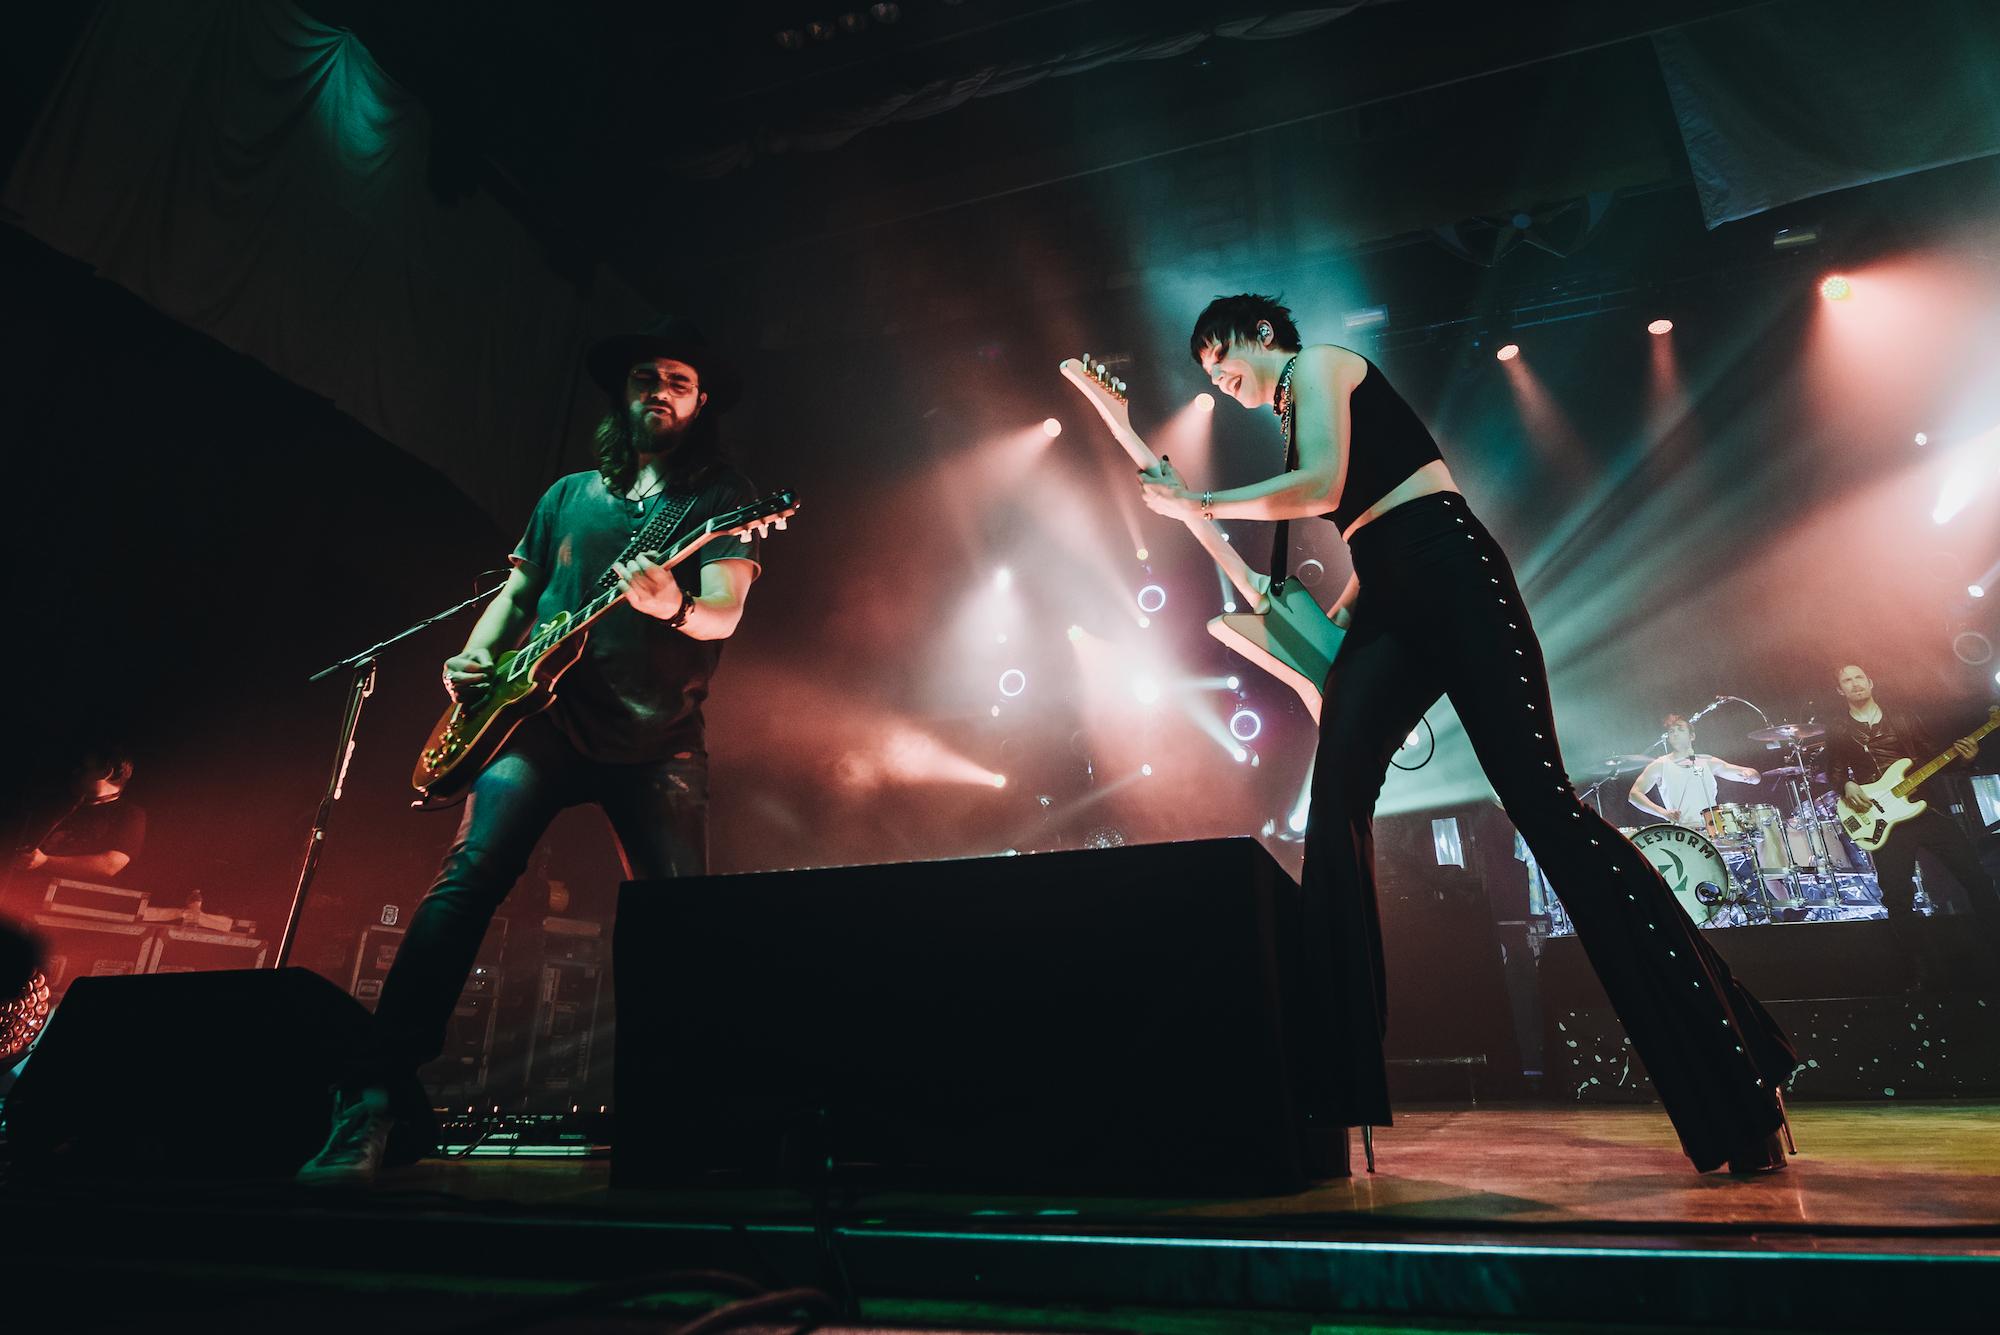 Halestorm performing live in Springfield, Missouri